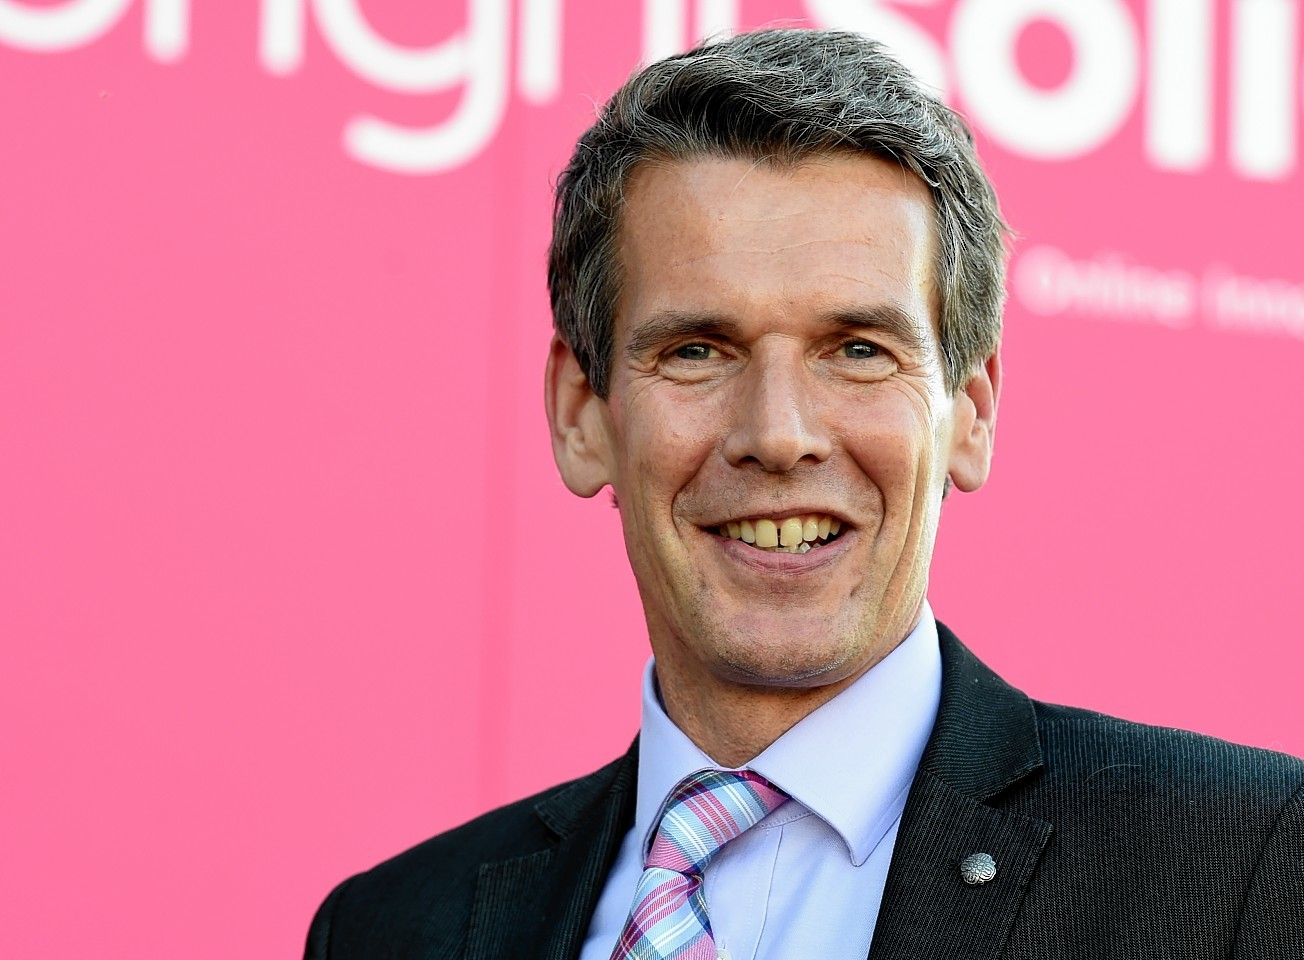 Richard Higgs, brightsolid CEO